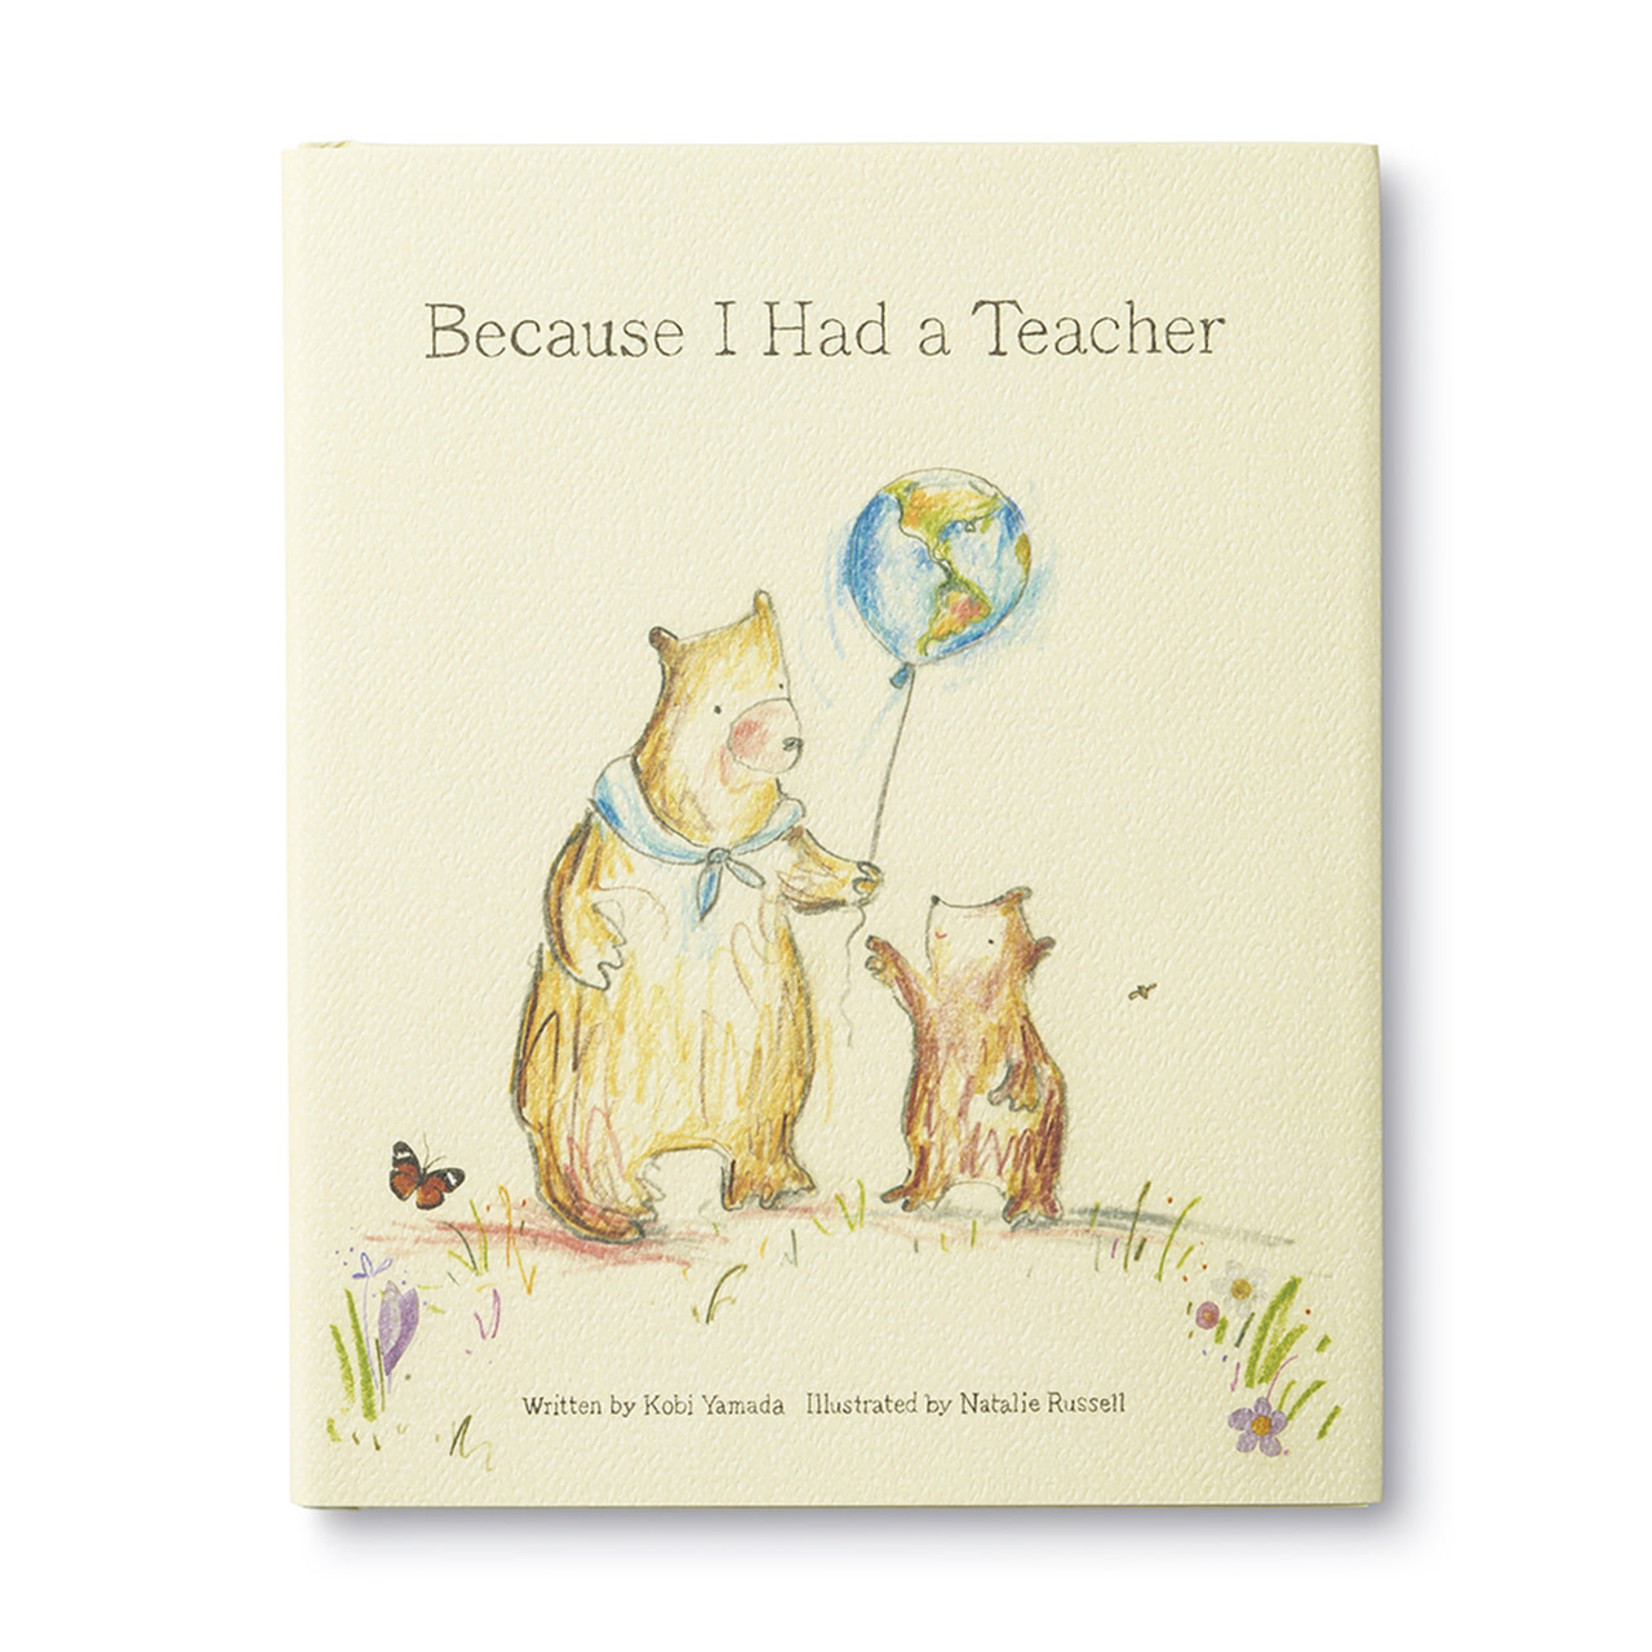 GIFT BOOK - BECAUSE I HAD A TEACHER